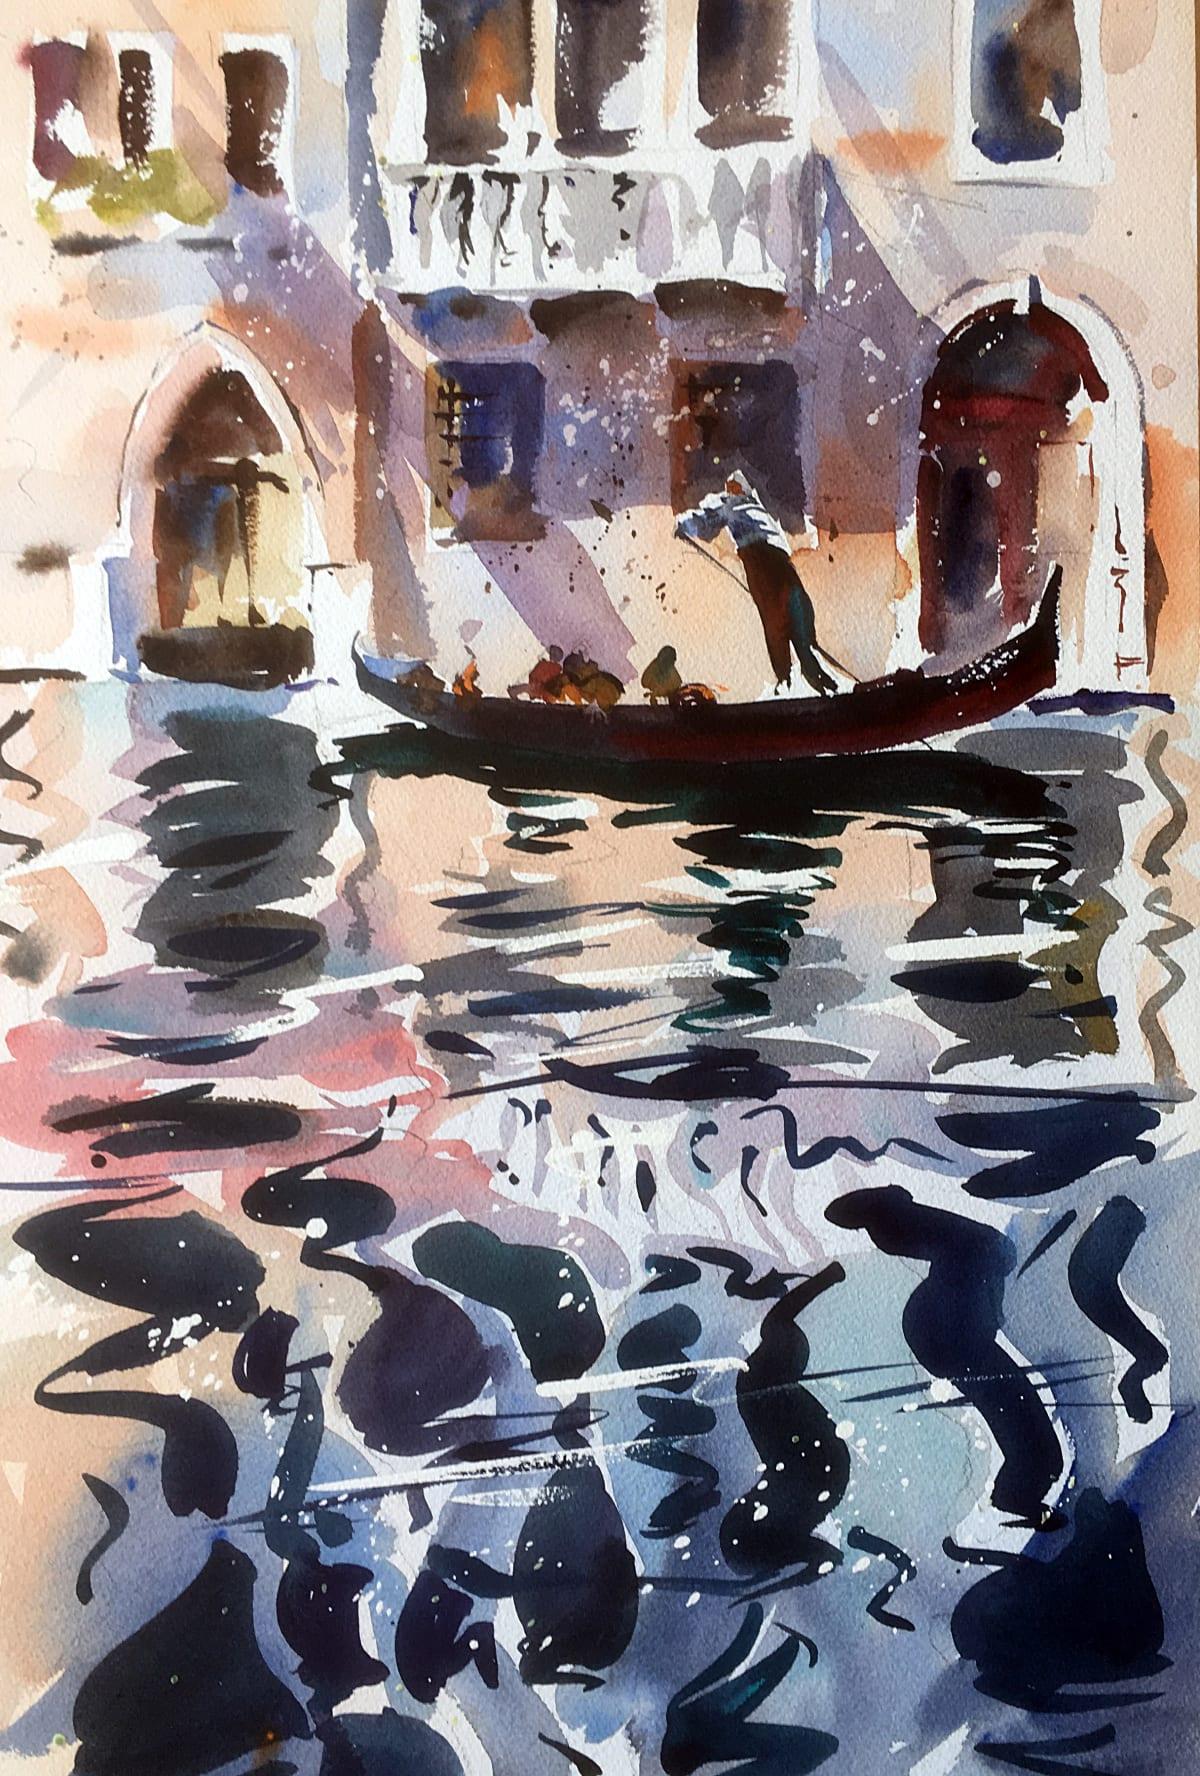 Jake Winkle REFLECTIONS OF VENICE Watercolour 18 x 13 in. 45.72 x 33.02 cm